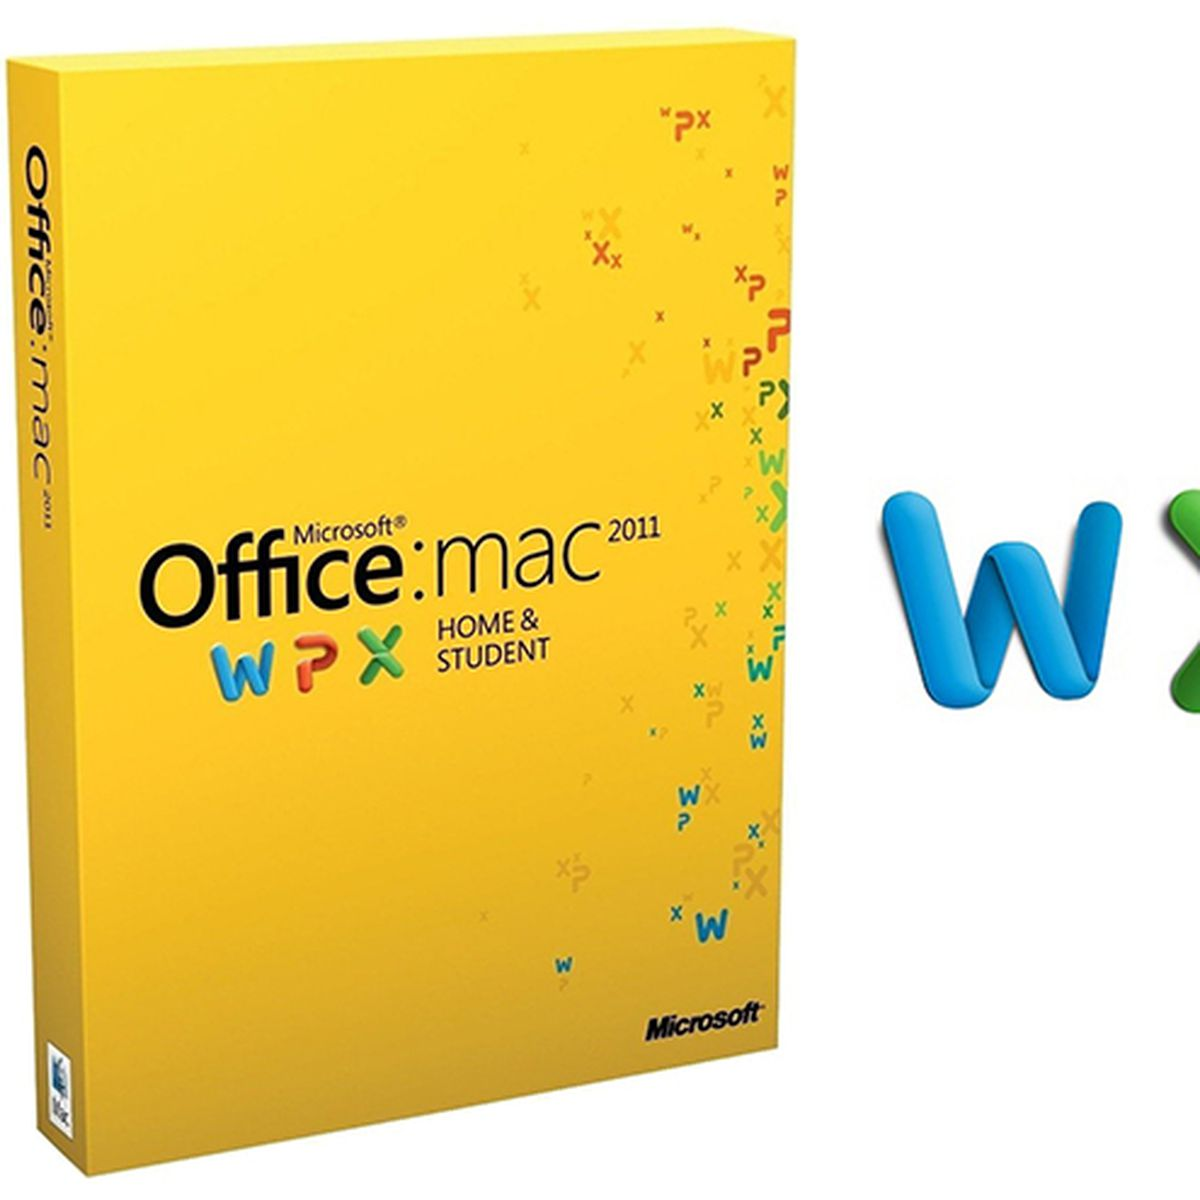 Microsoft word for mac 2011 version 14.7.7